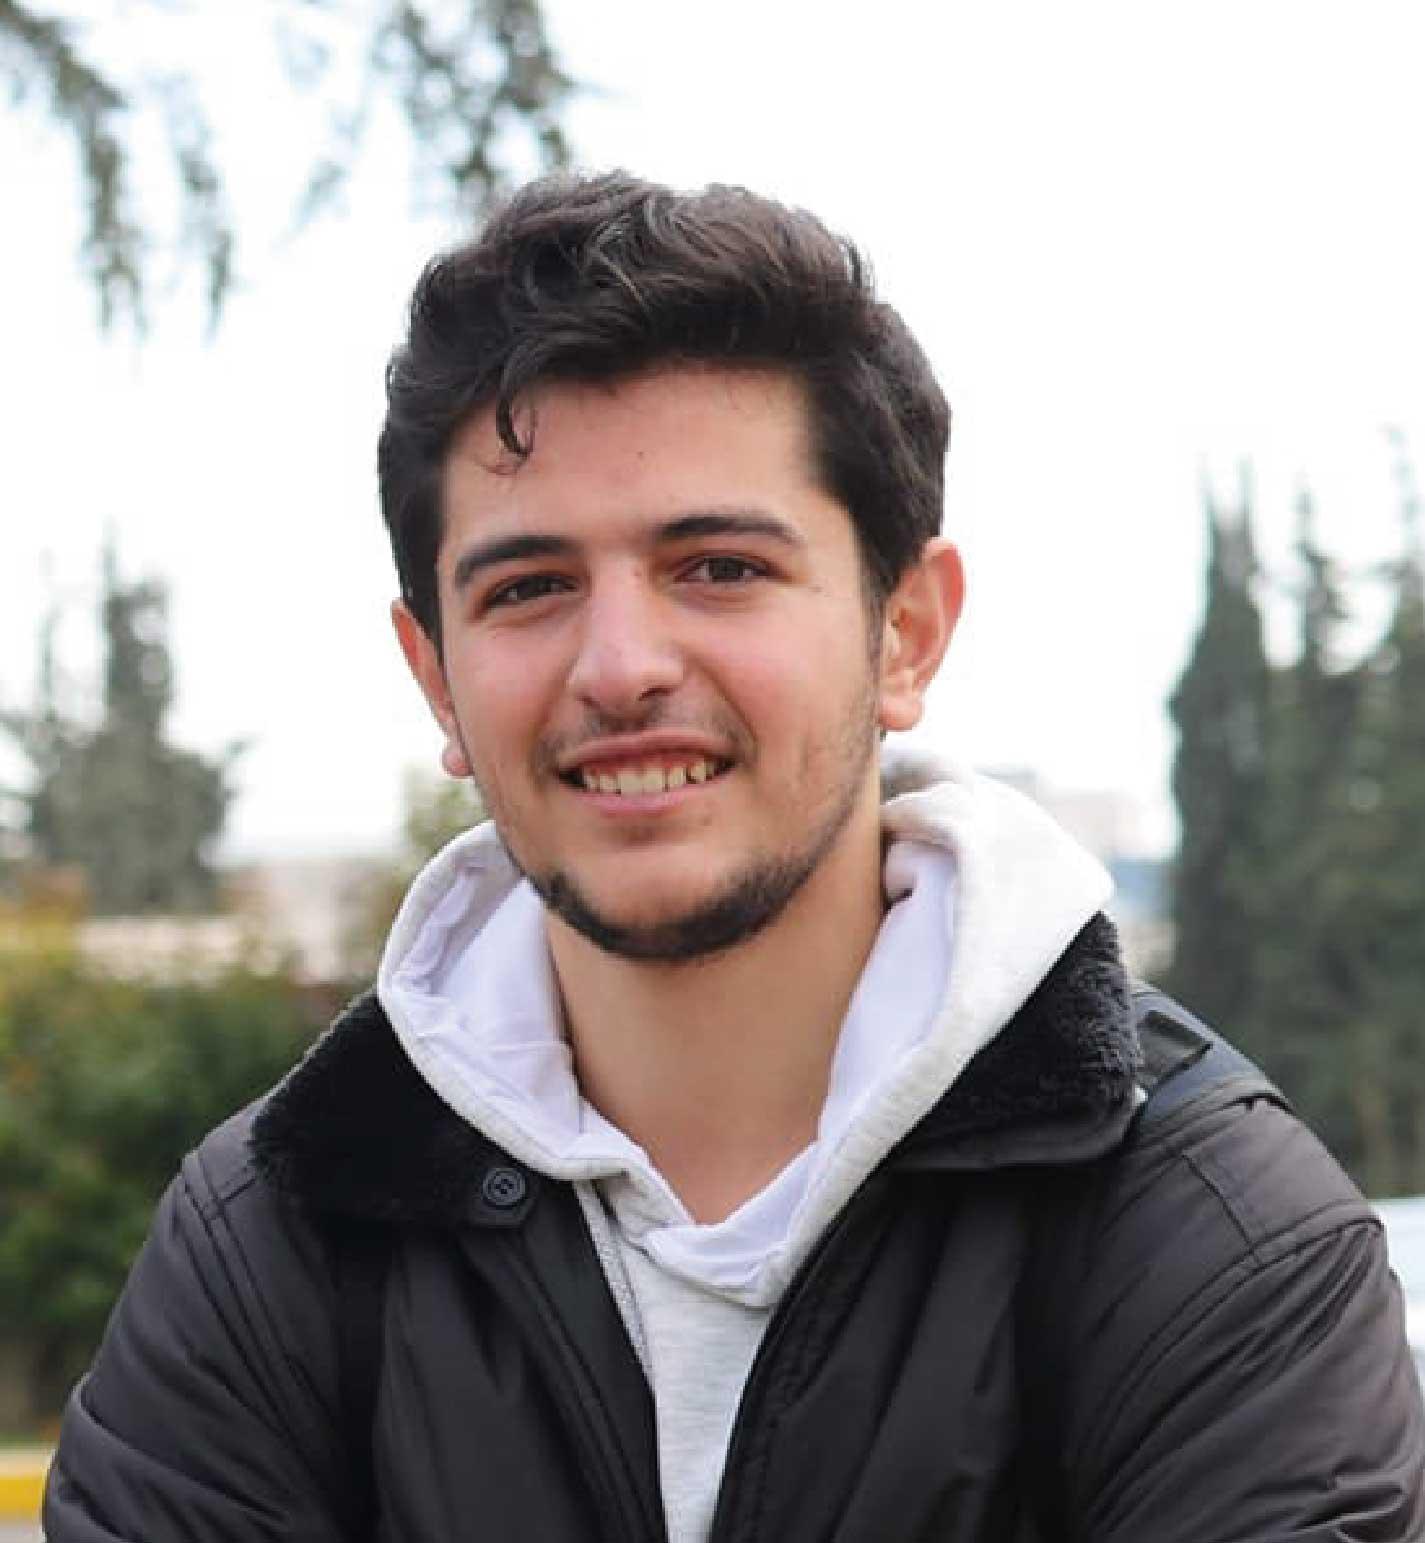 Hussam Alrifai